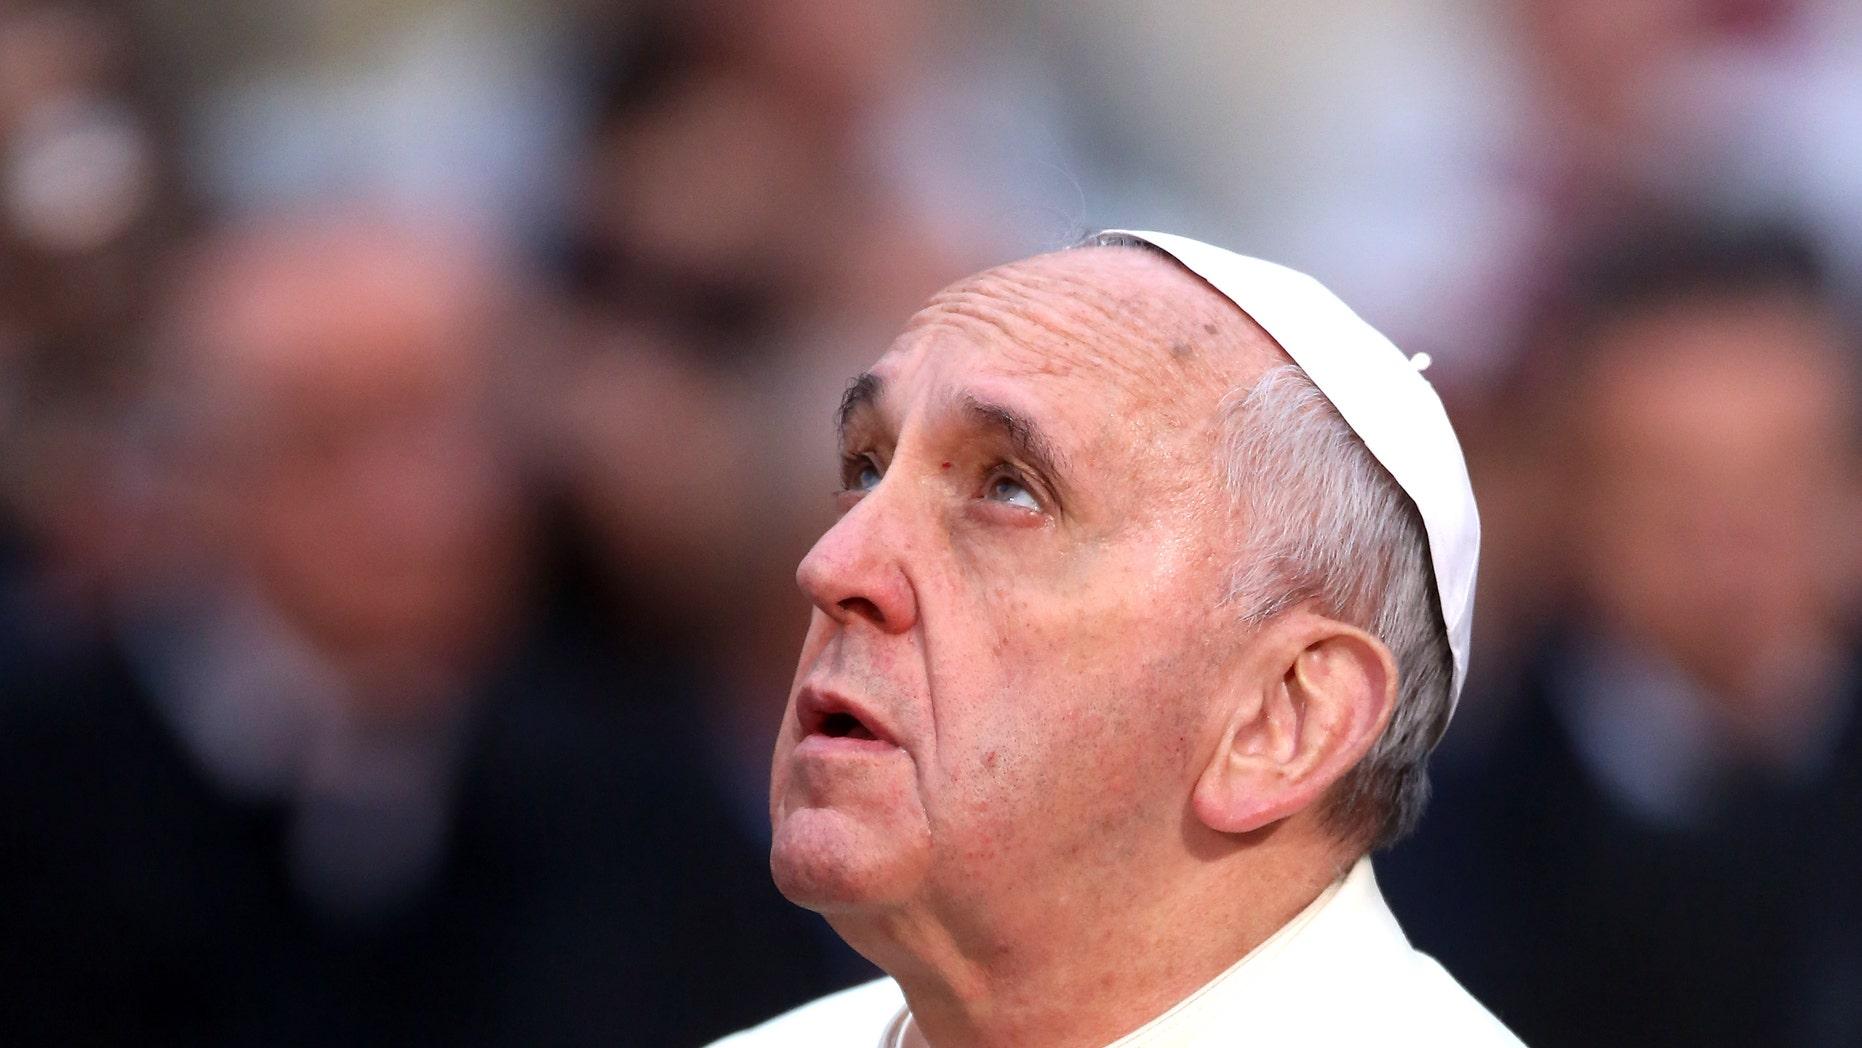 File photo: Pope Francis prays.